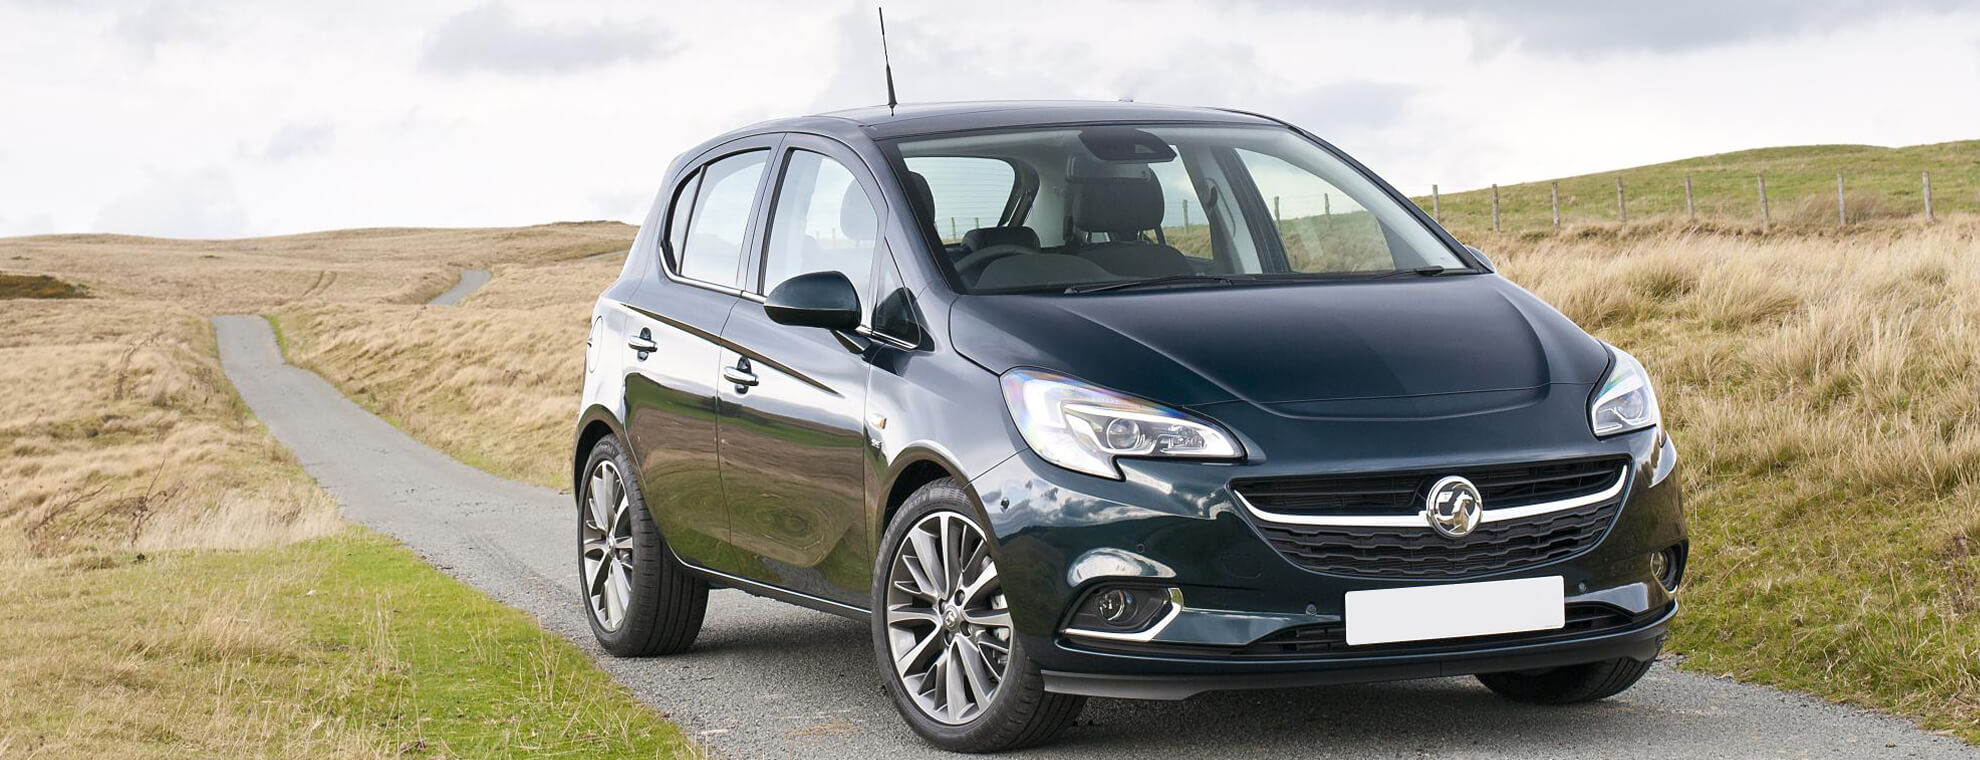 Ex Motability Car Sales Yorkshire